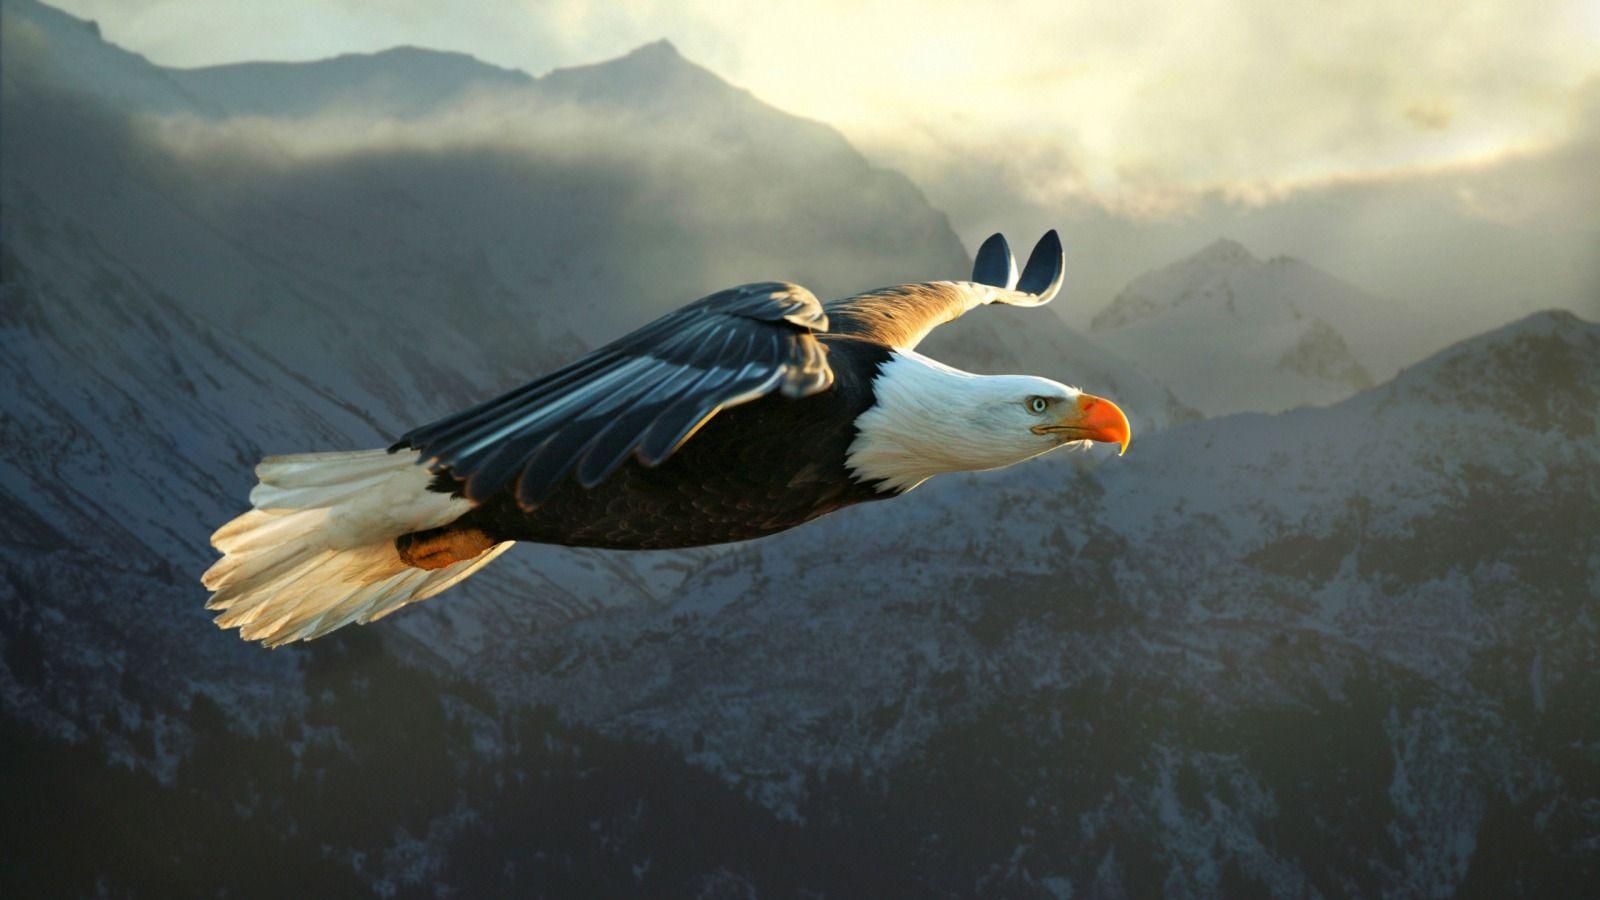 Popular Wallpaper Horse Eagle - b869b1761002aa46dbd95163cc7a2f53  2018_573199.jpg